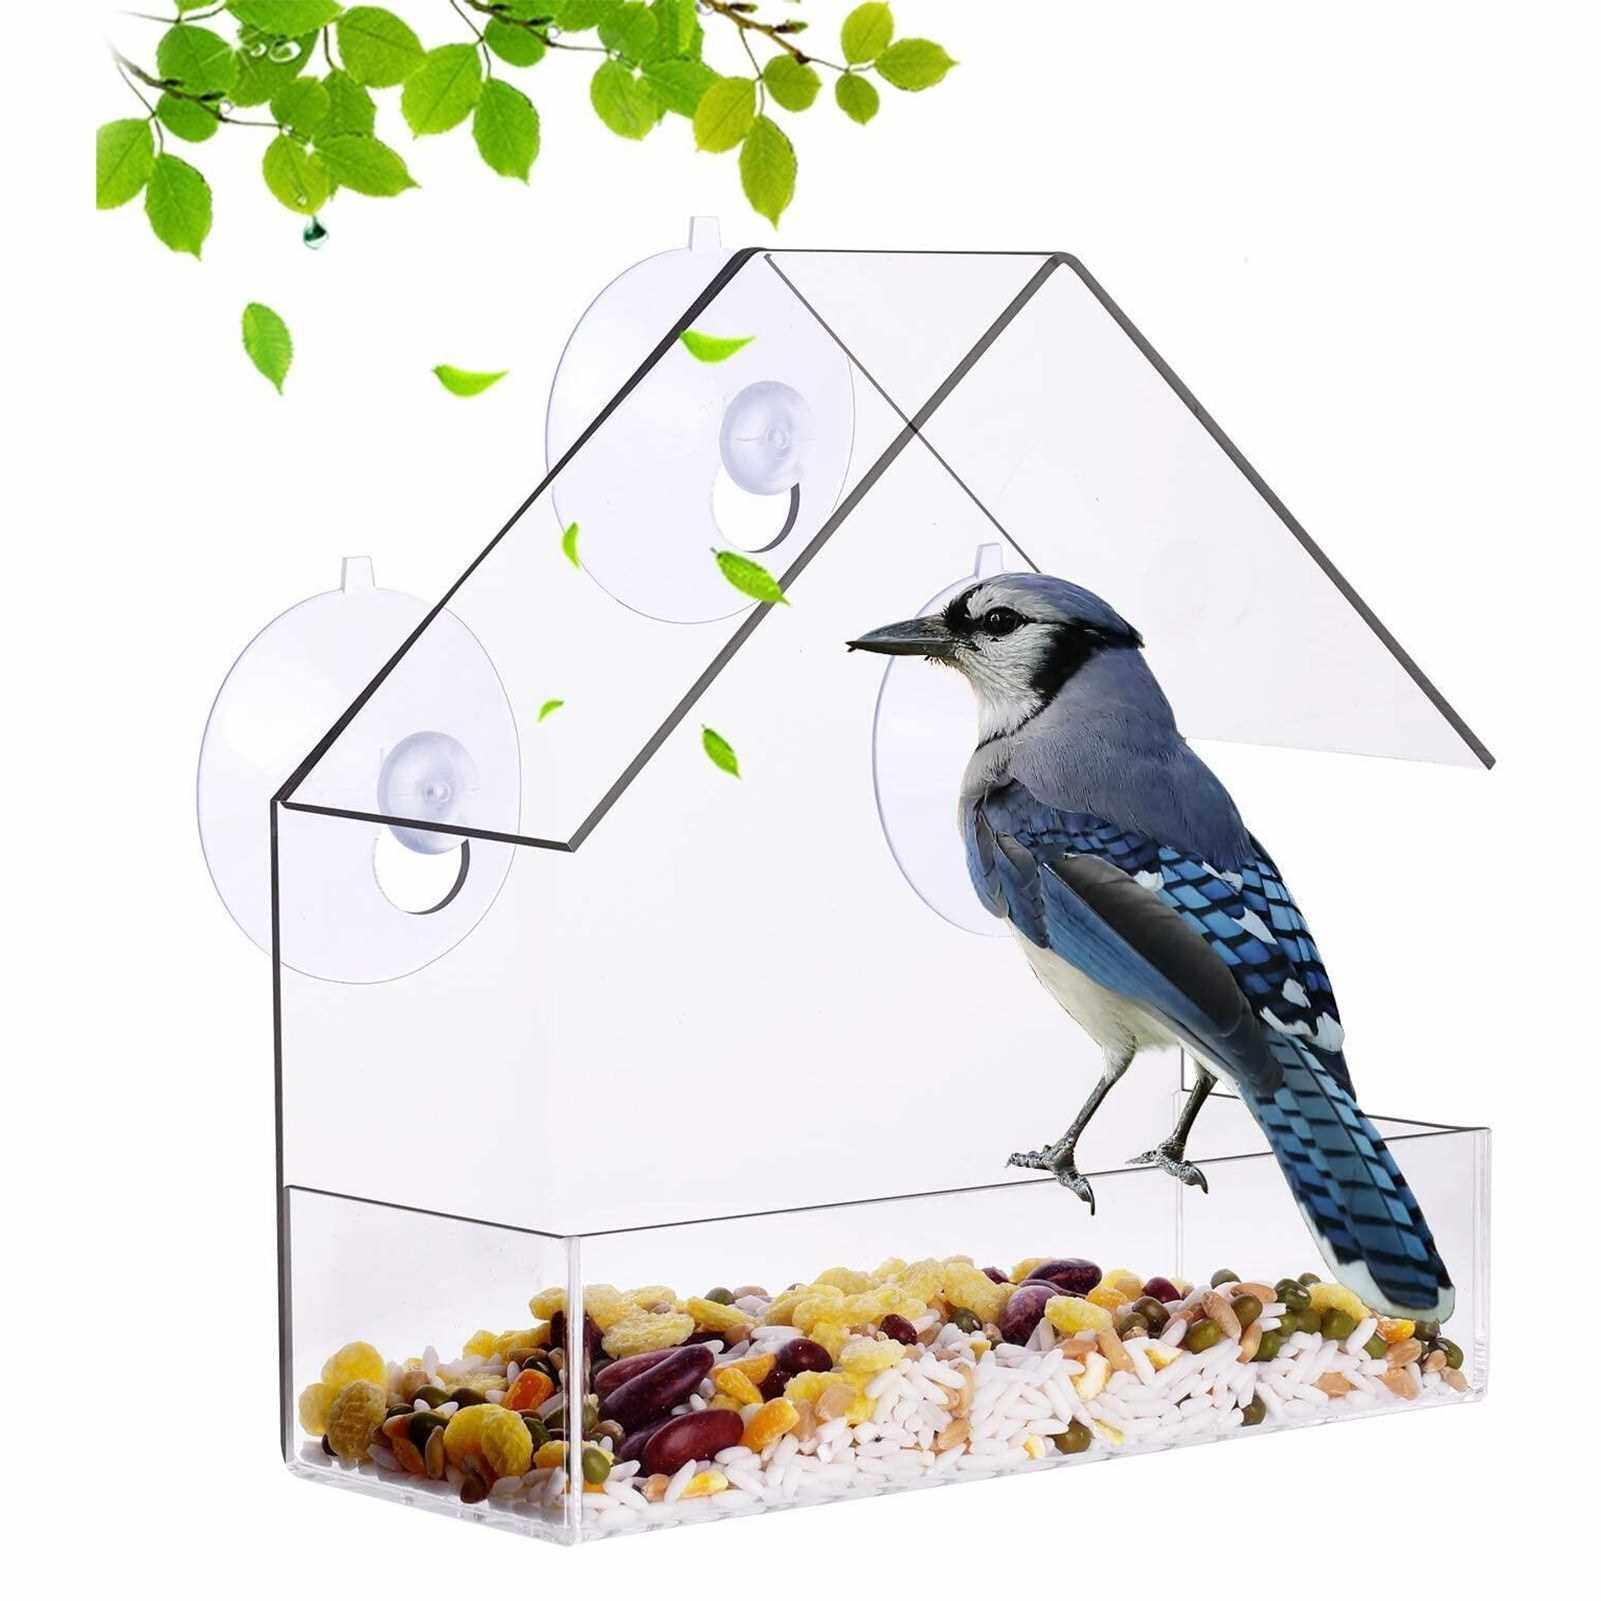 Wall-Mounted Suction Cup Mounting Bird Feeder Transparents Acrylic Lightweight Waterproof Bird Feeder (Standard)